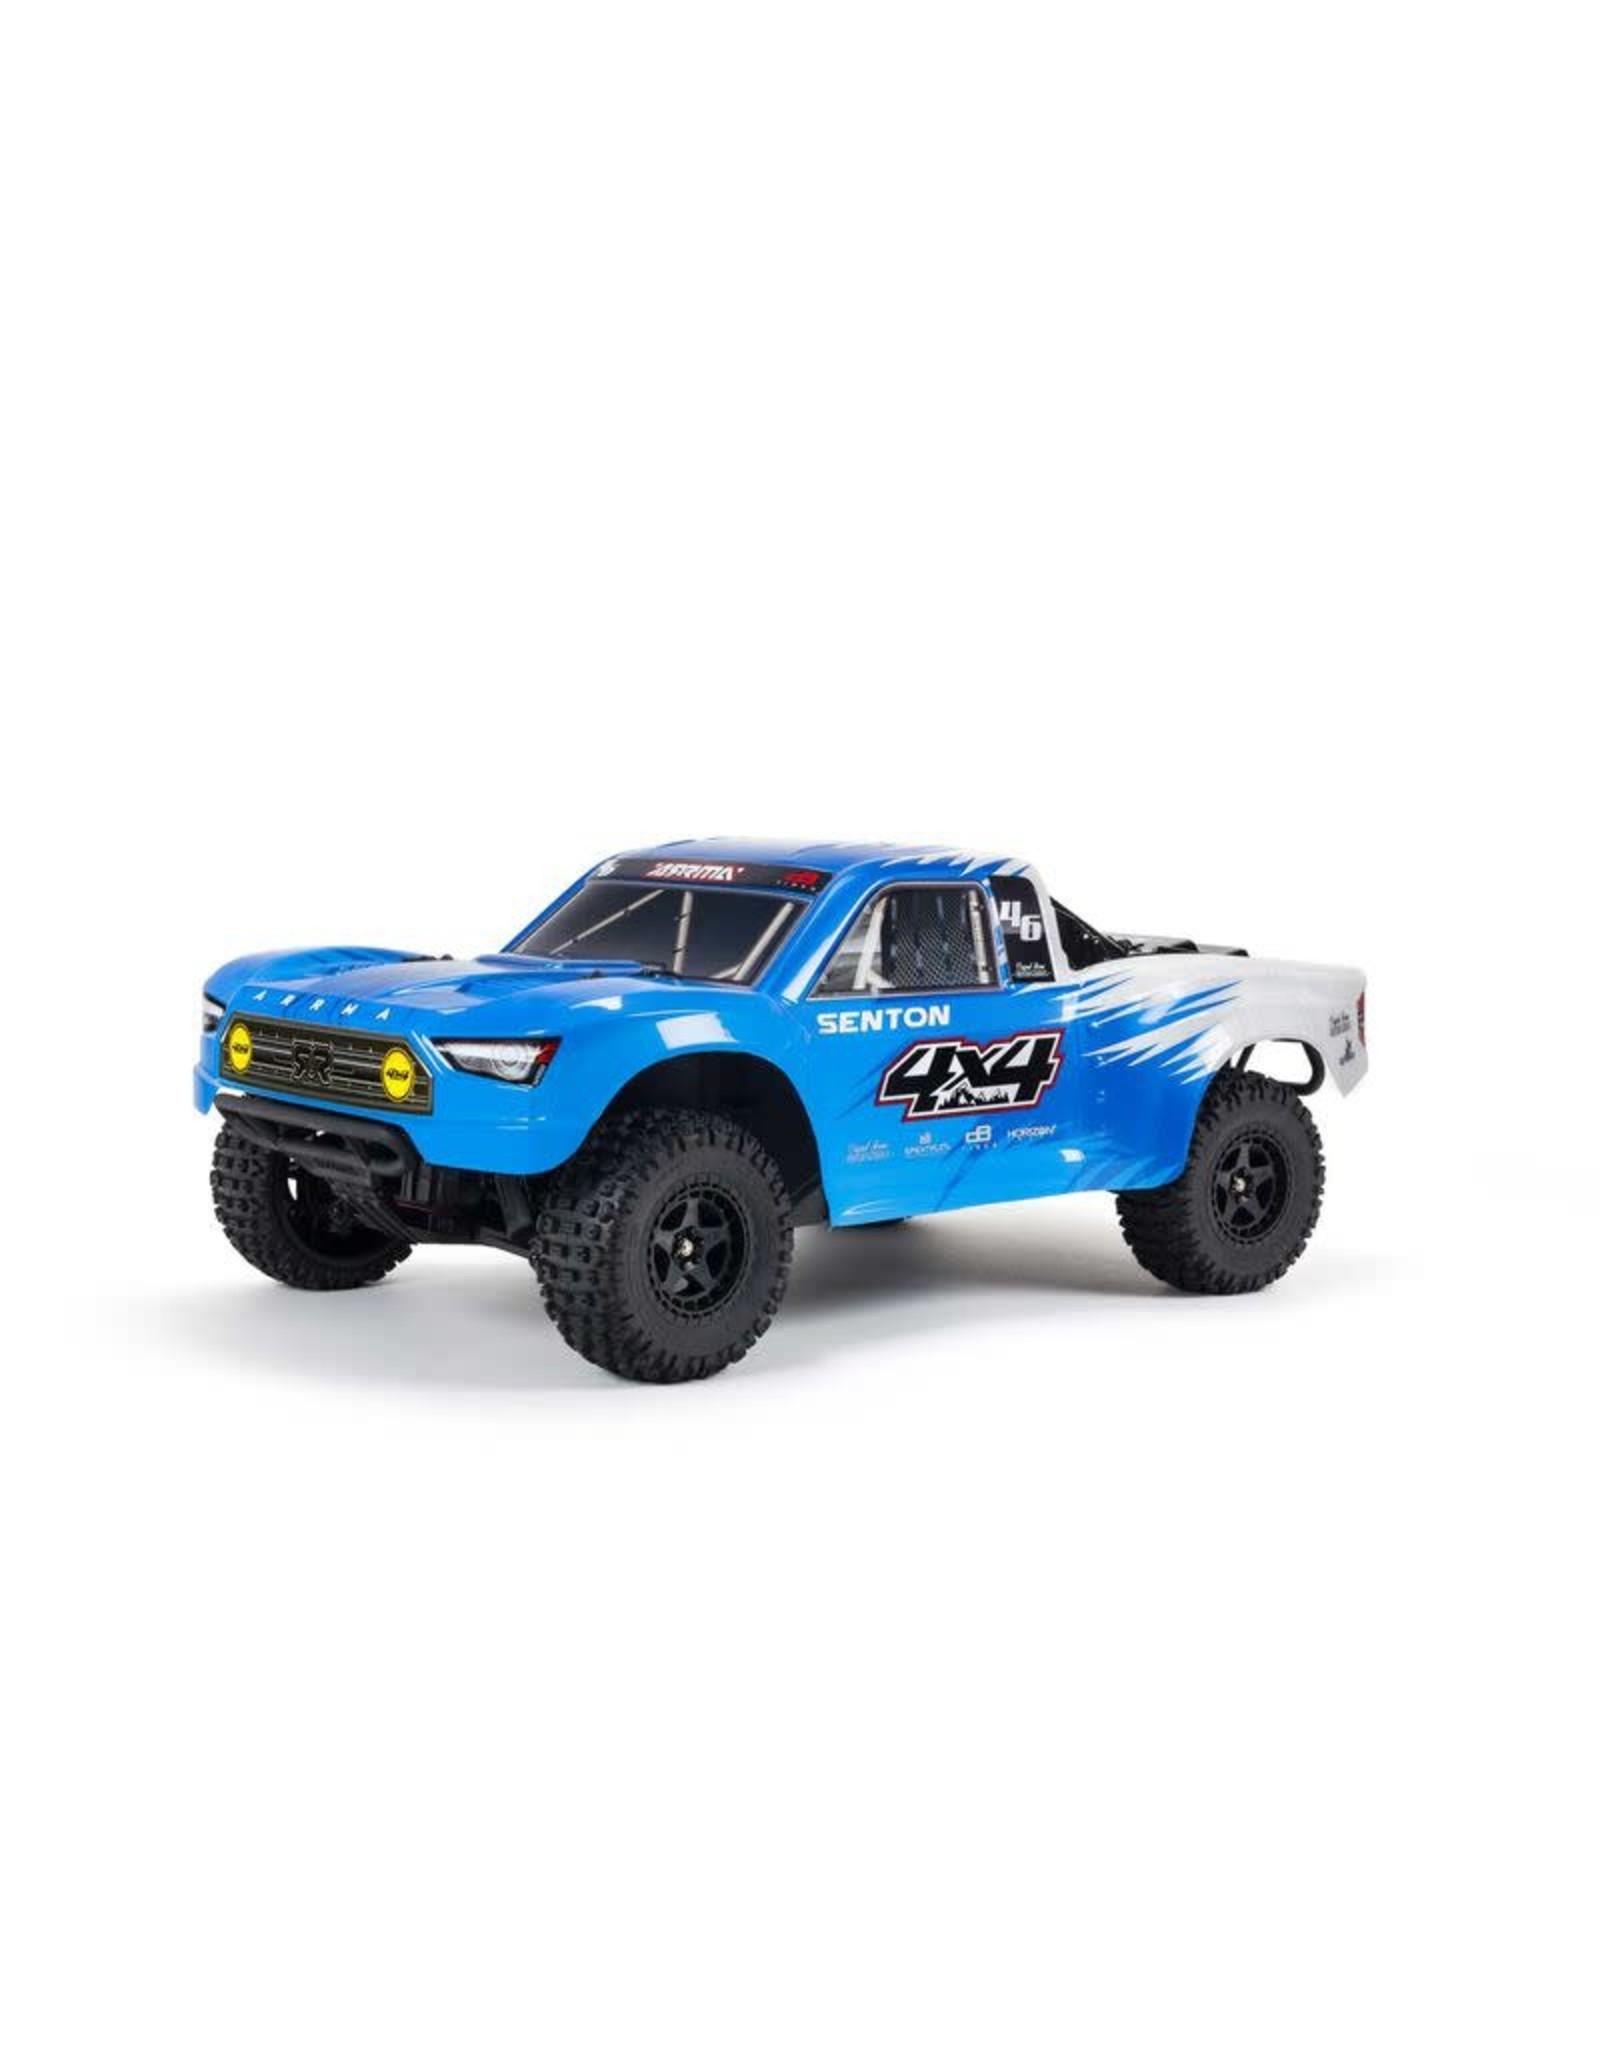 ARRMA 1/10 SENTON 4X4 V3 MEGA 550 Brushed Short Course Truck RTR, Blue